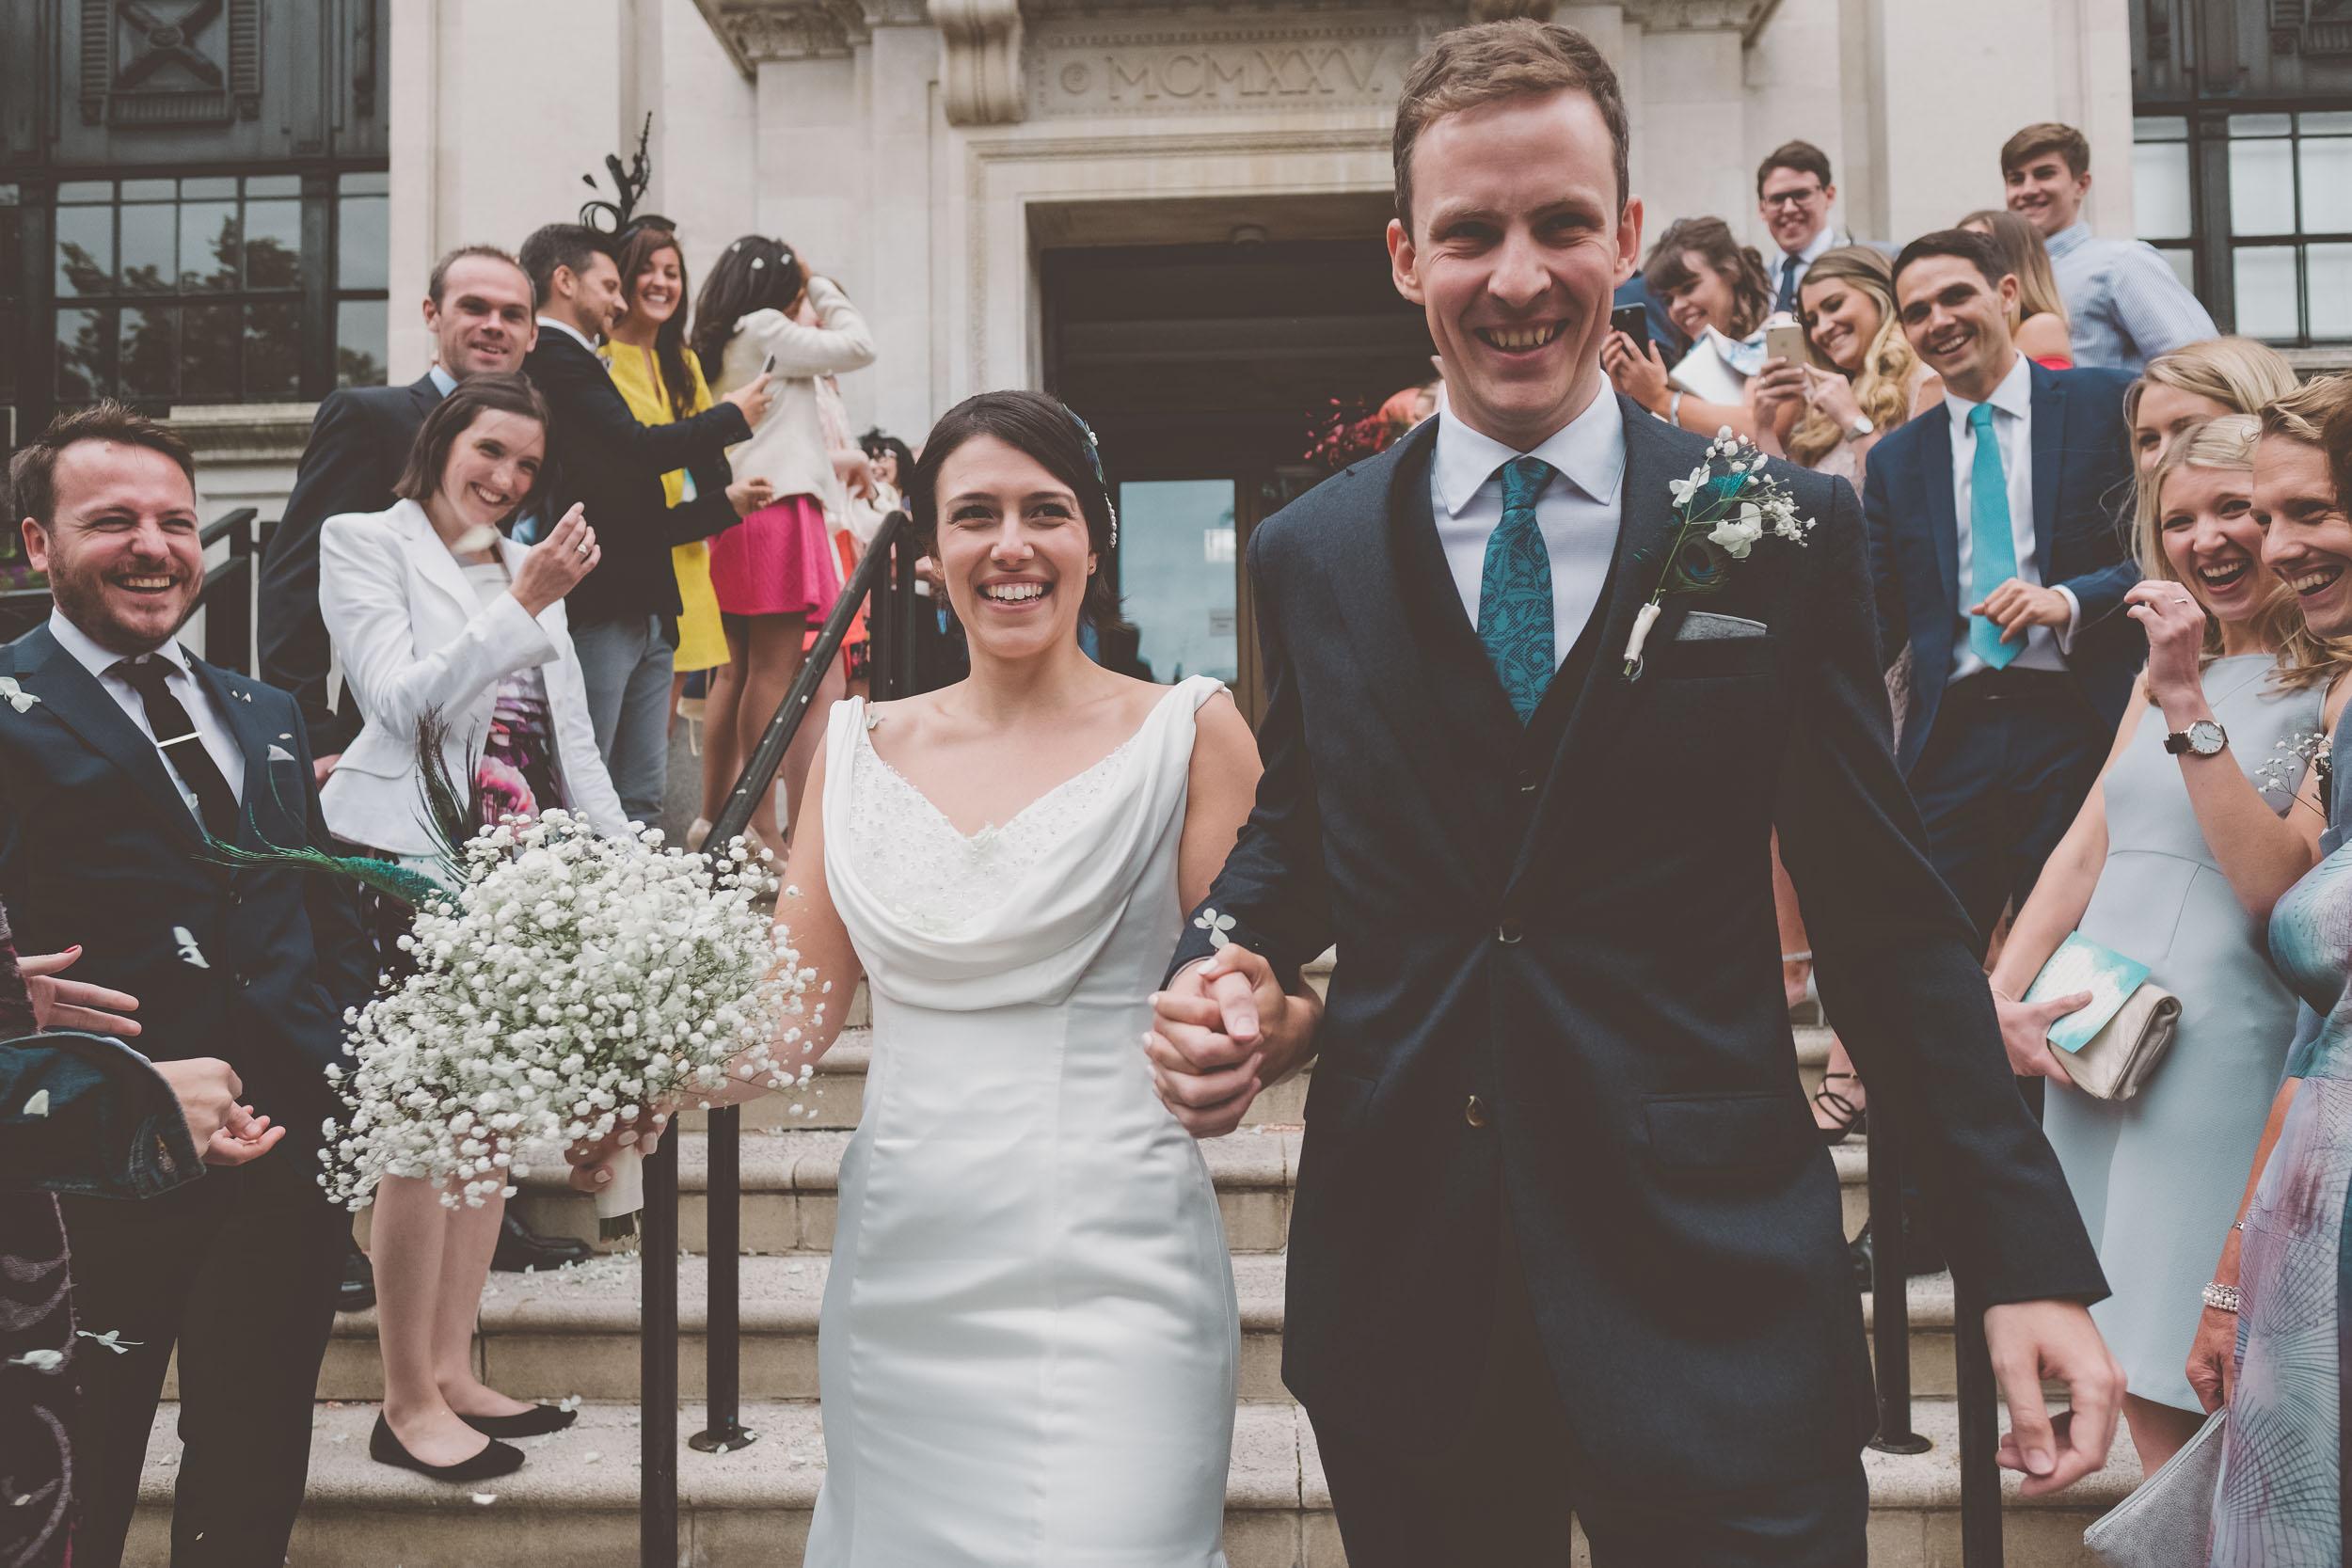 islington-town-hall-4th-floor-studios-wedding158.jpg